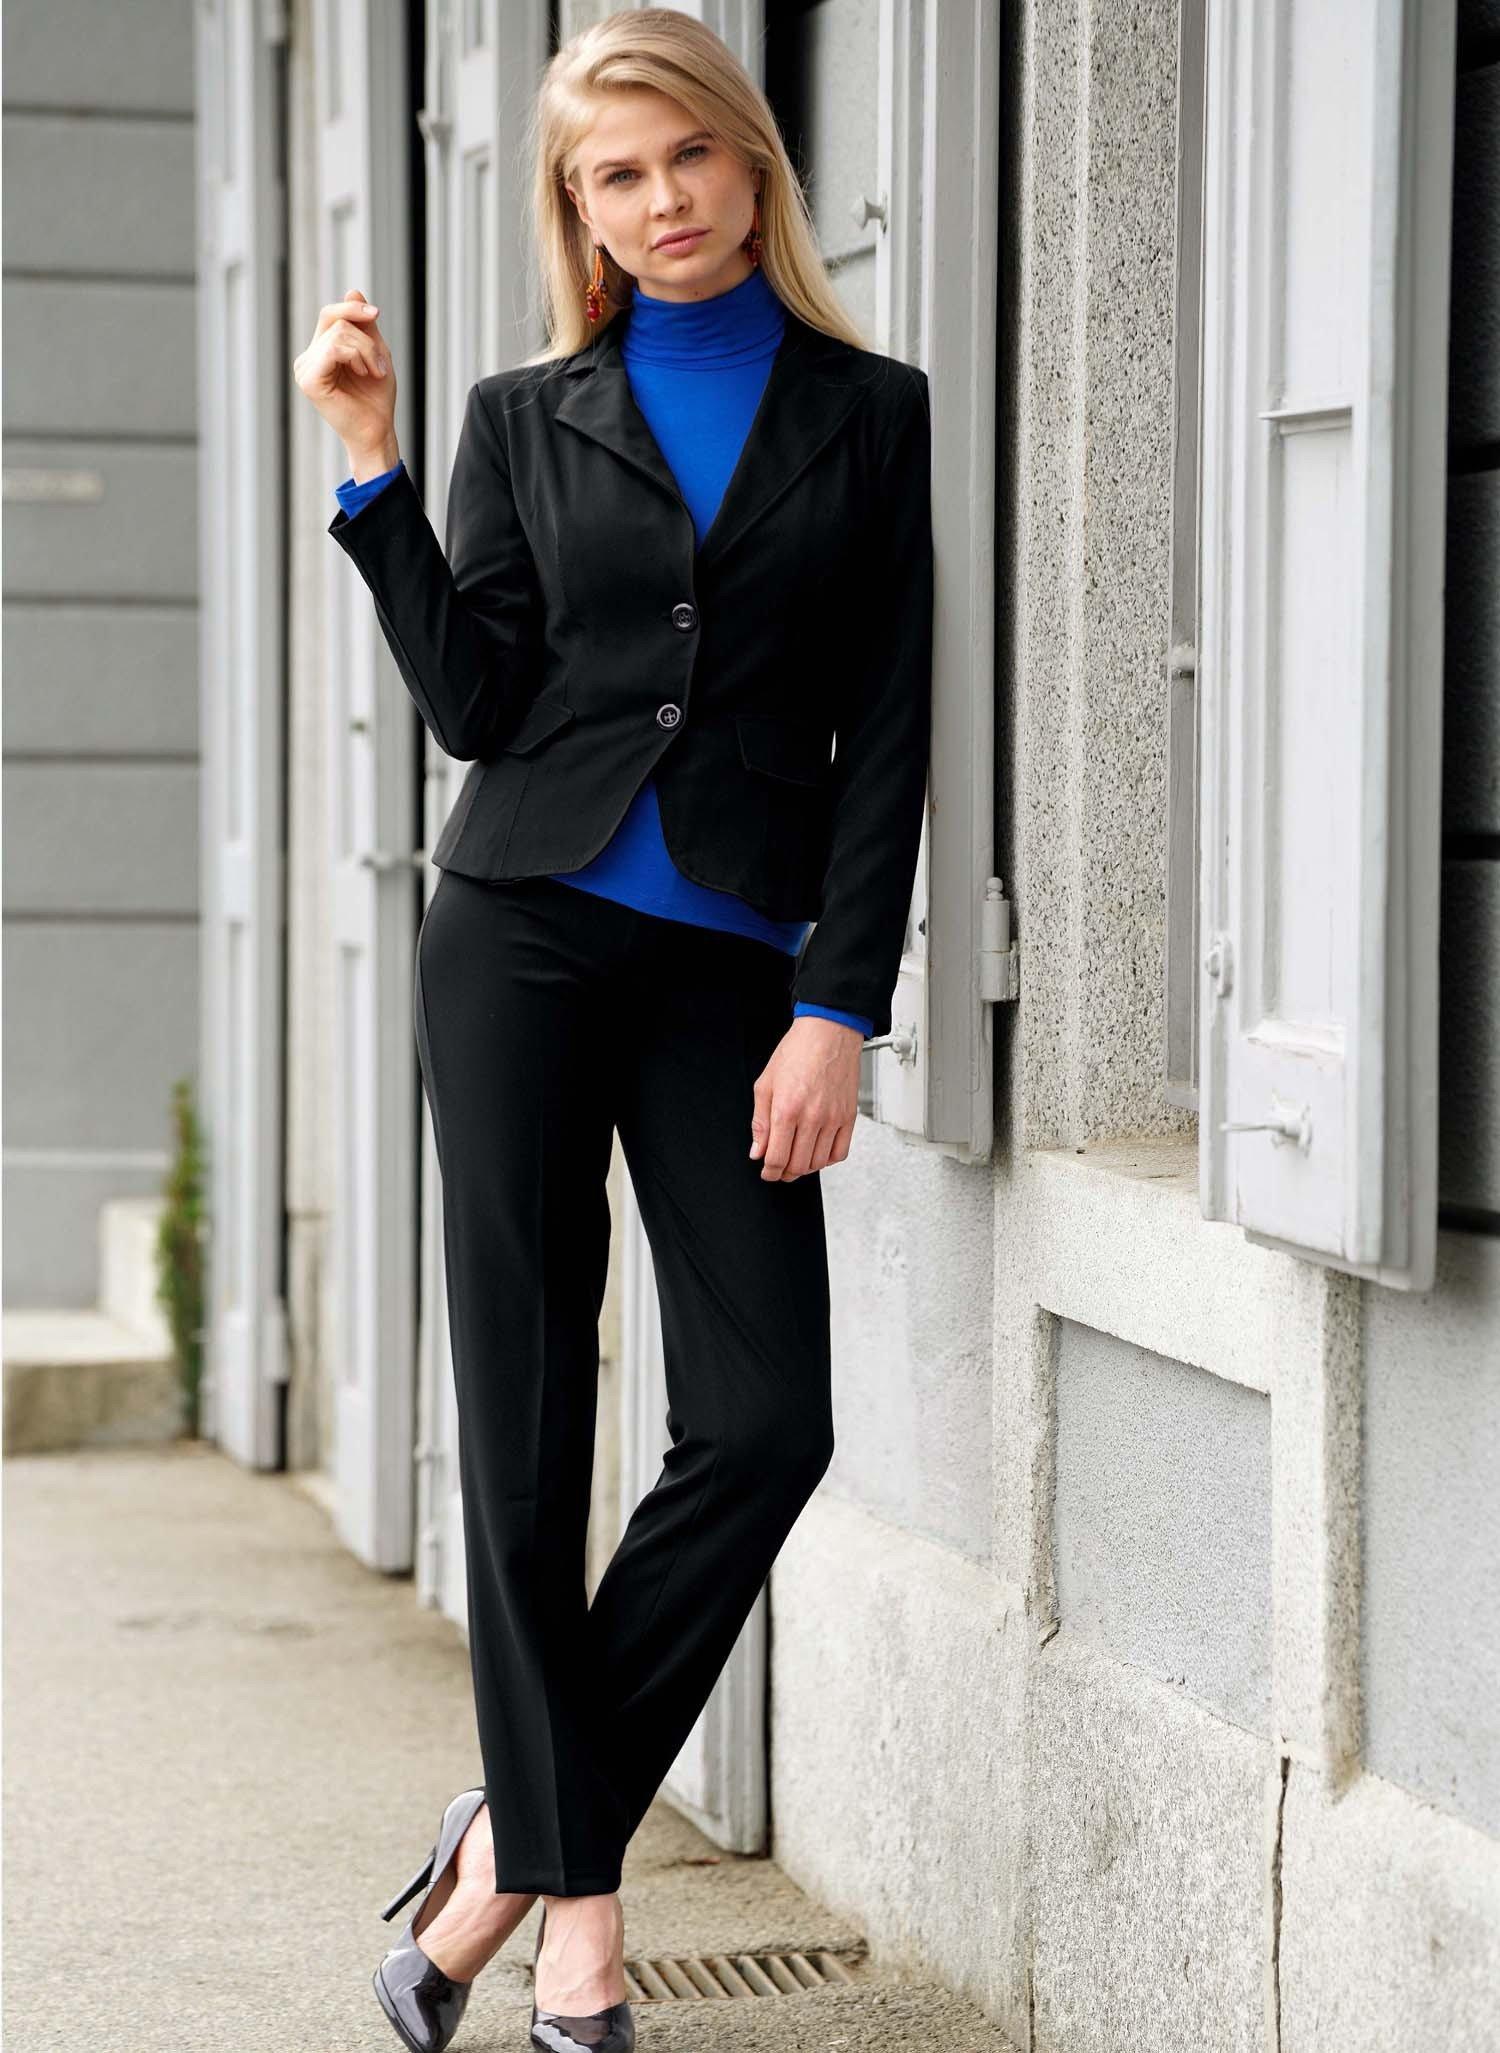 D-Hosen-Anzug schwarz 36 010 - 2 - Ronja.ch